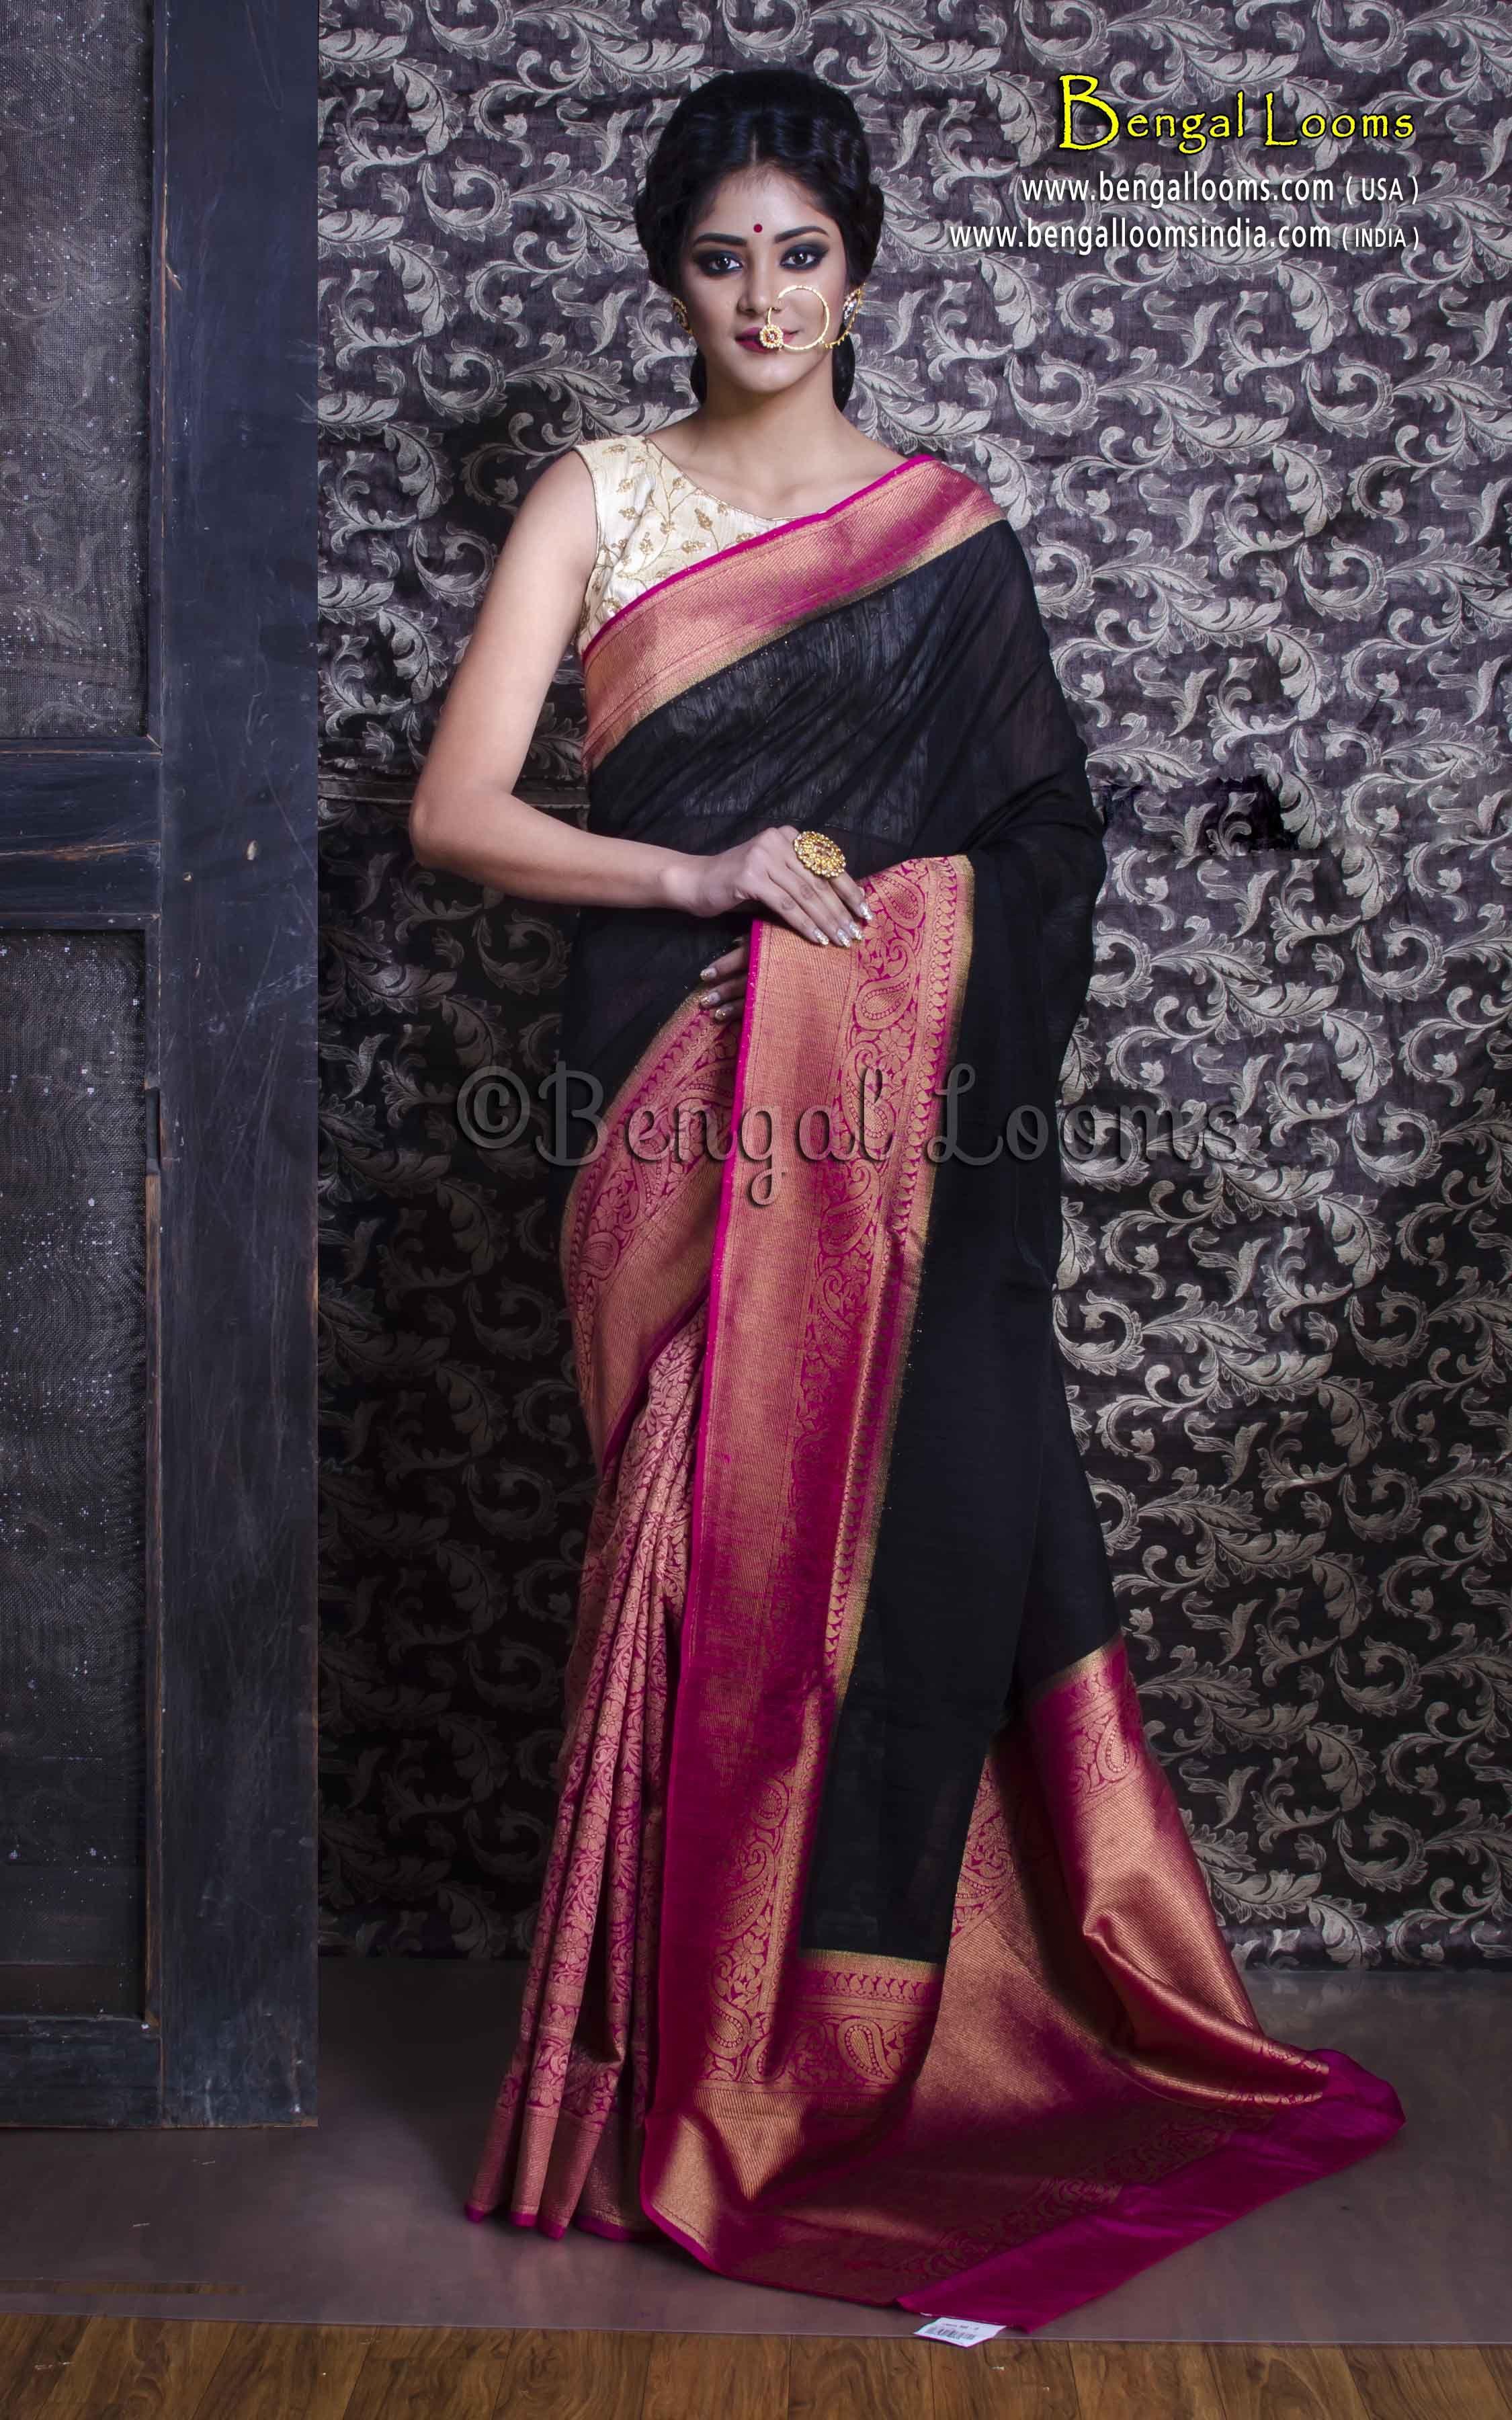 1f8b4c1774f Chanderi Cotton Half and Half Banarasi Saree in Black and Rani ...